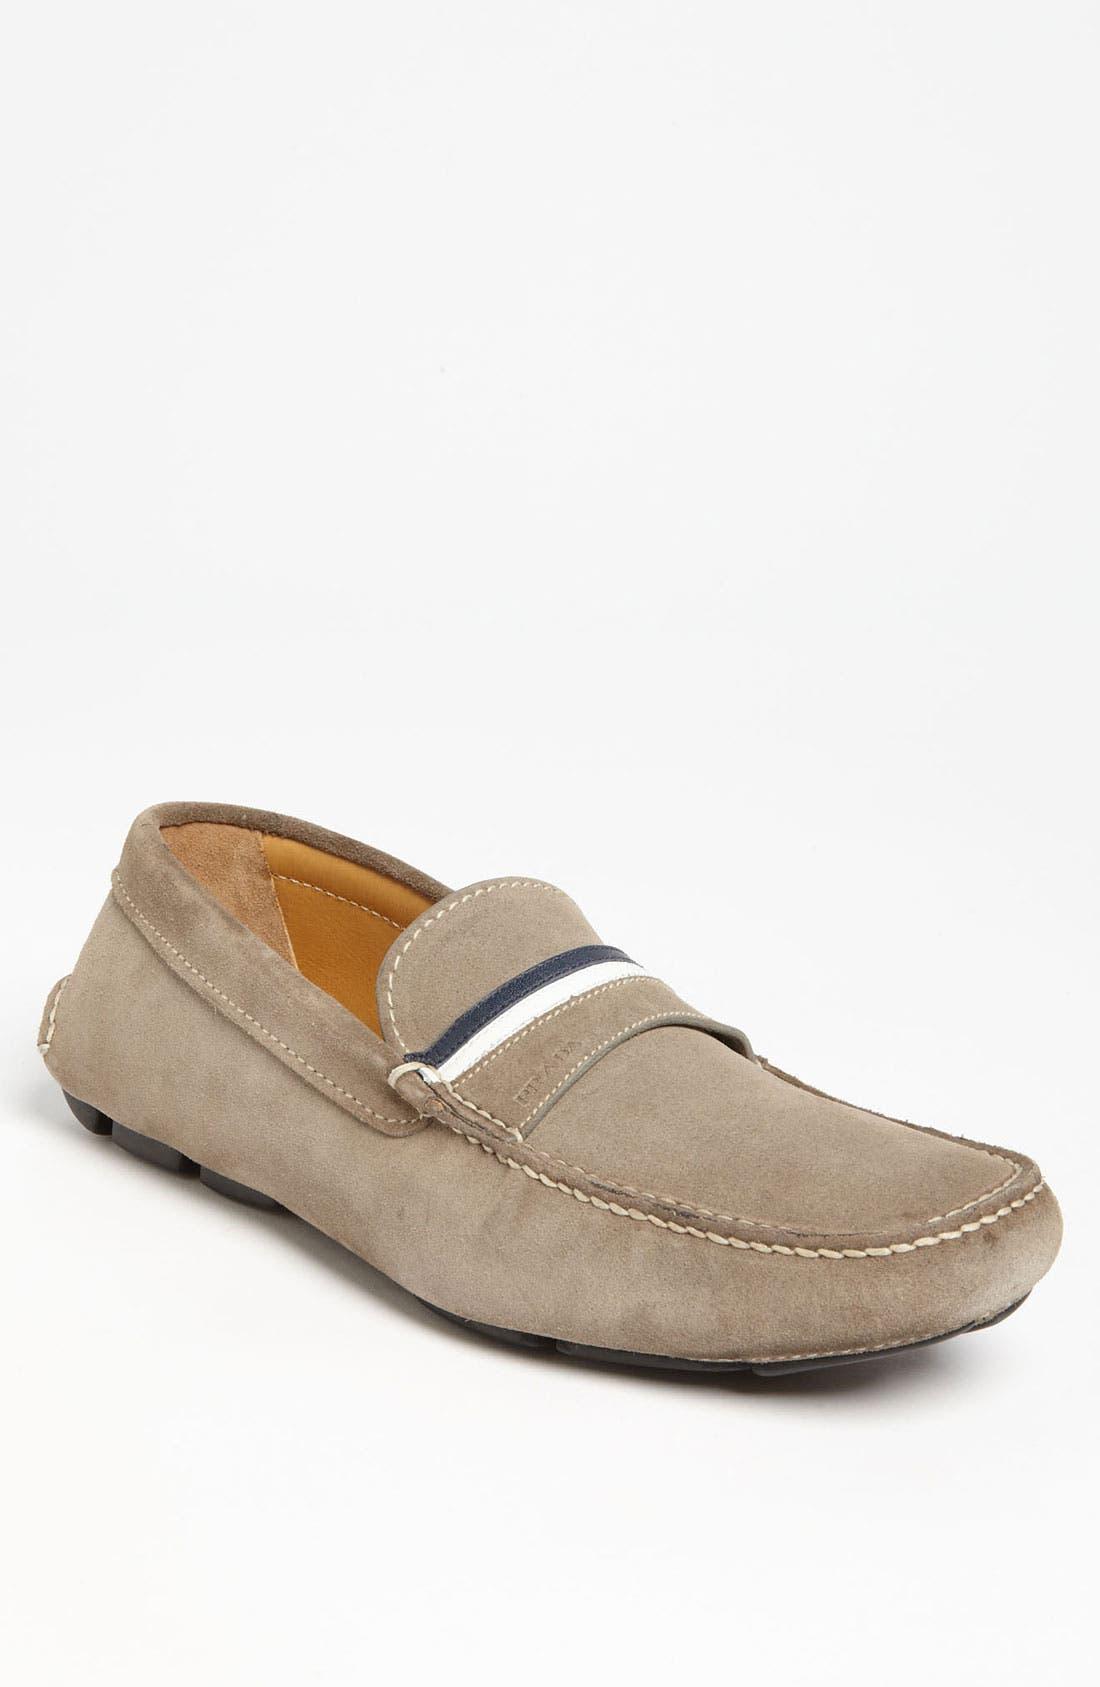 Main Image - Prada Suede Driving Shoe